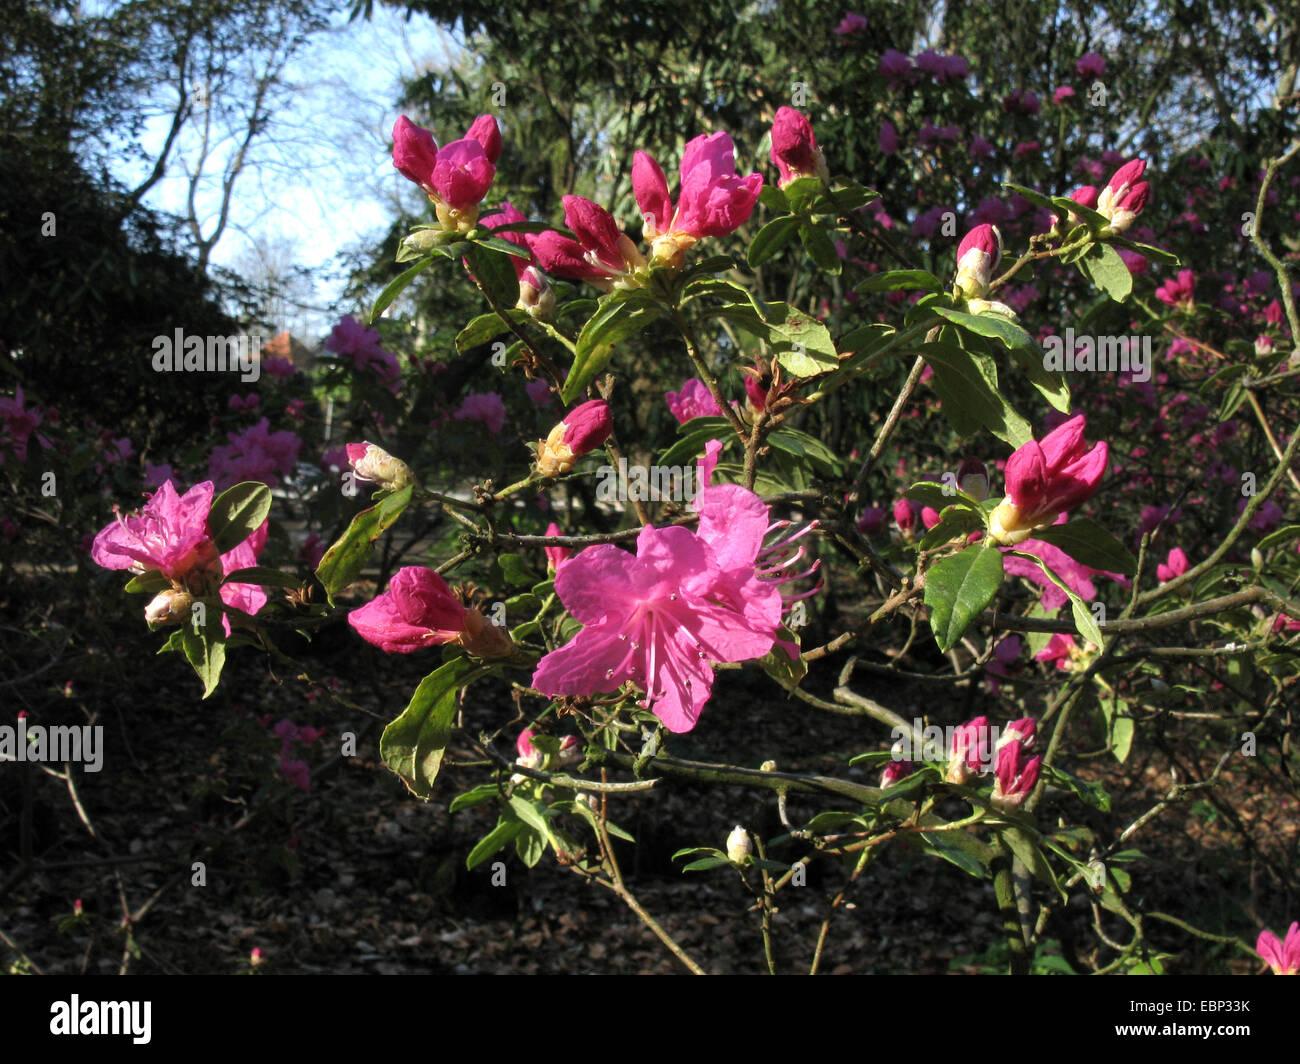 Chinese Alprose, Dahurian azalea (Rhododendron dauricum 'Ostara', Rhododendron dauricum Ostara), blooming - Stock Image